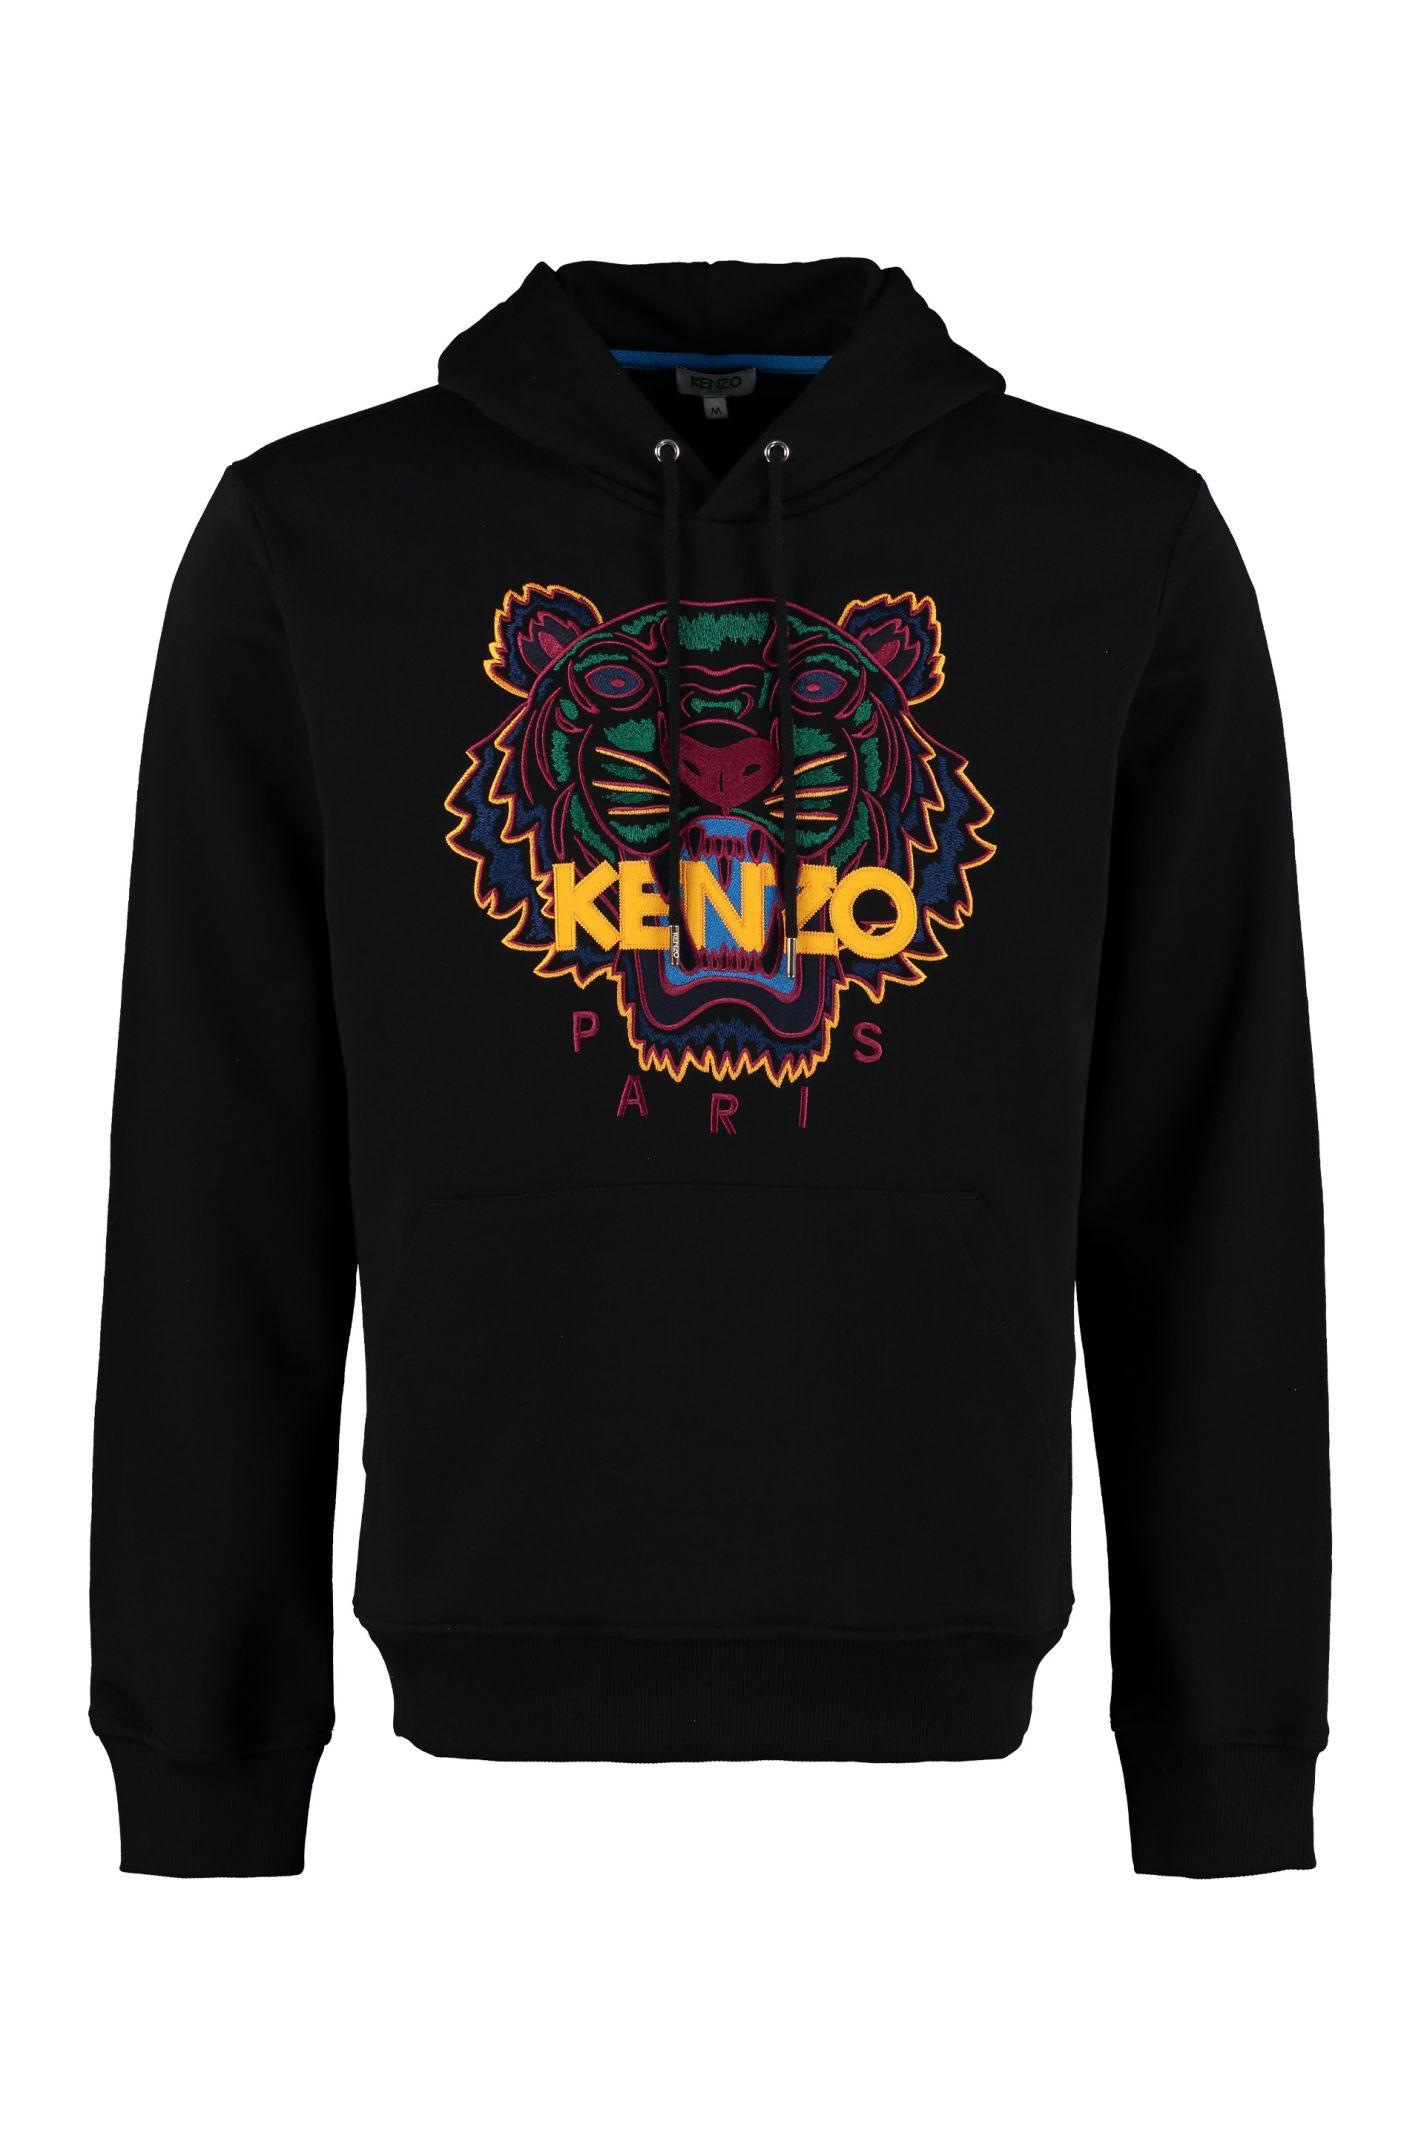 10df0f1cd74 Kenzo Kenzo Tiger Embroidered Cotton Sweatshirt - blue - 10972884 ...